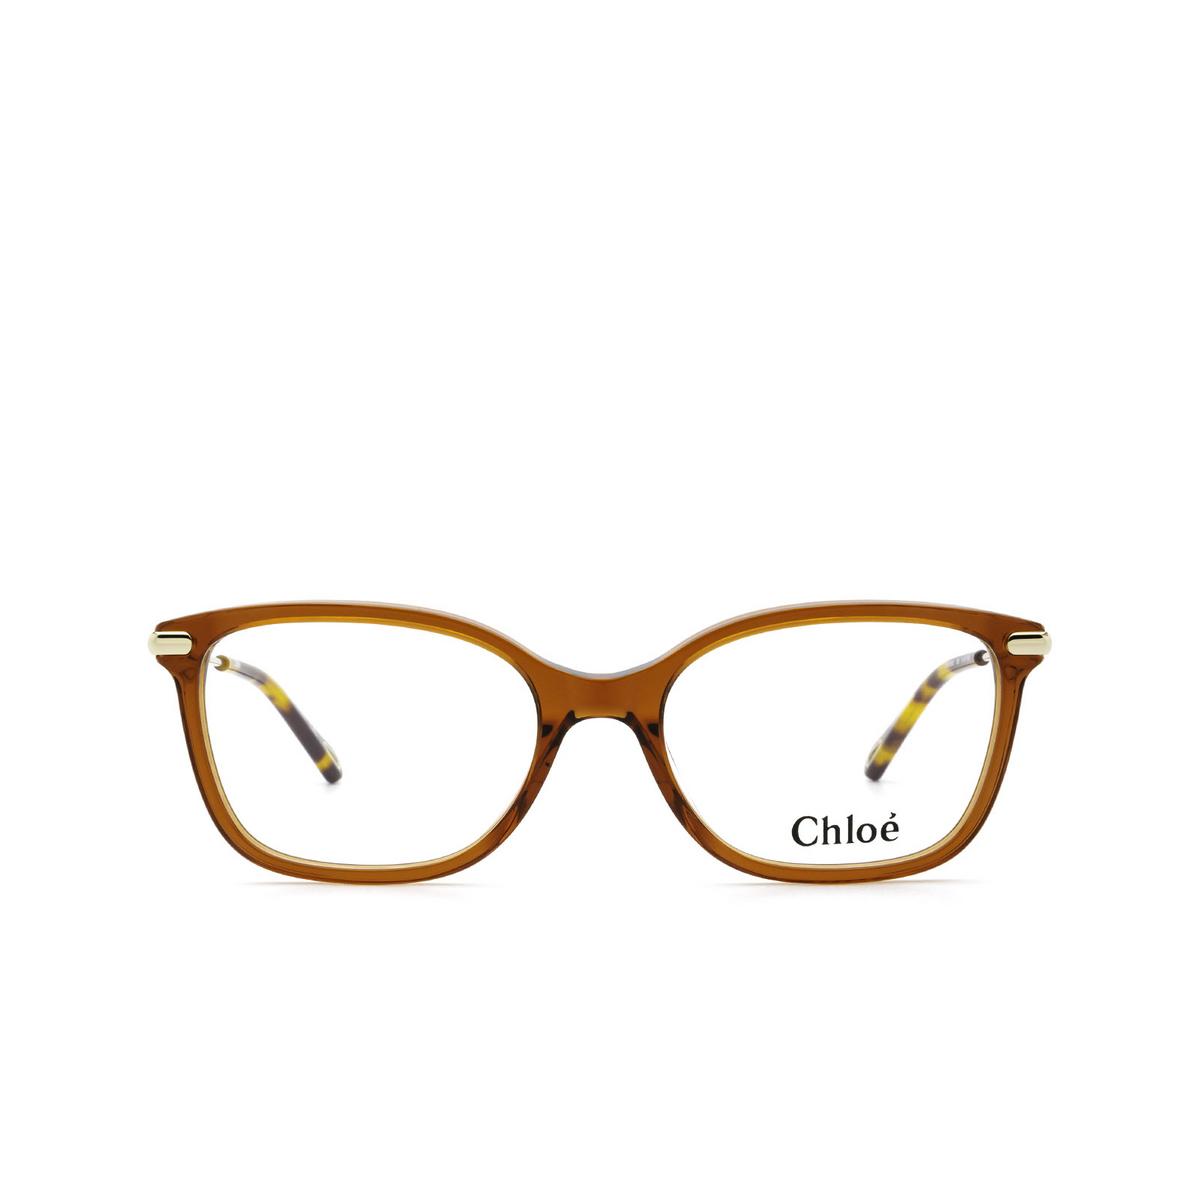 Chloé® Rectangle Eyeglasses: CH0059O color Orange 006 - front view.